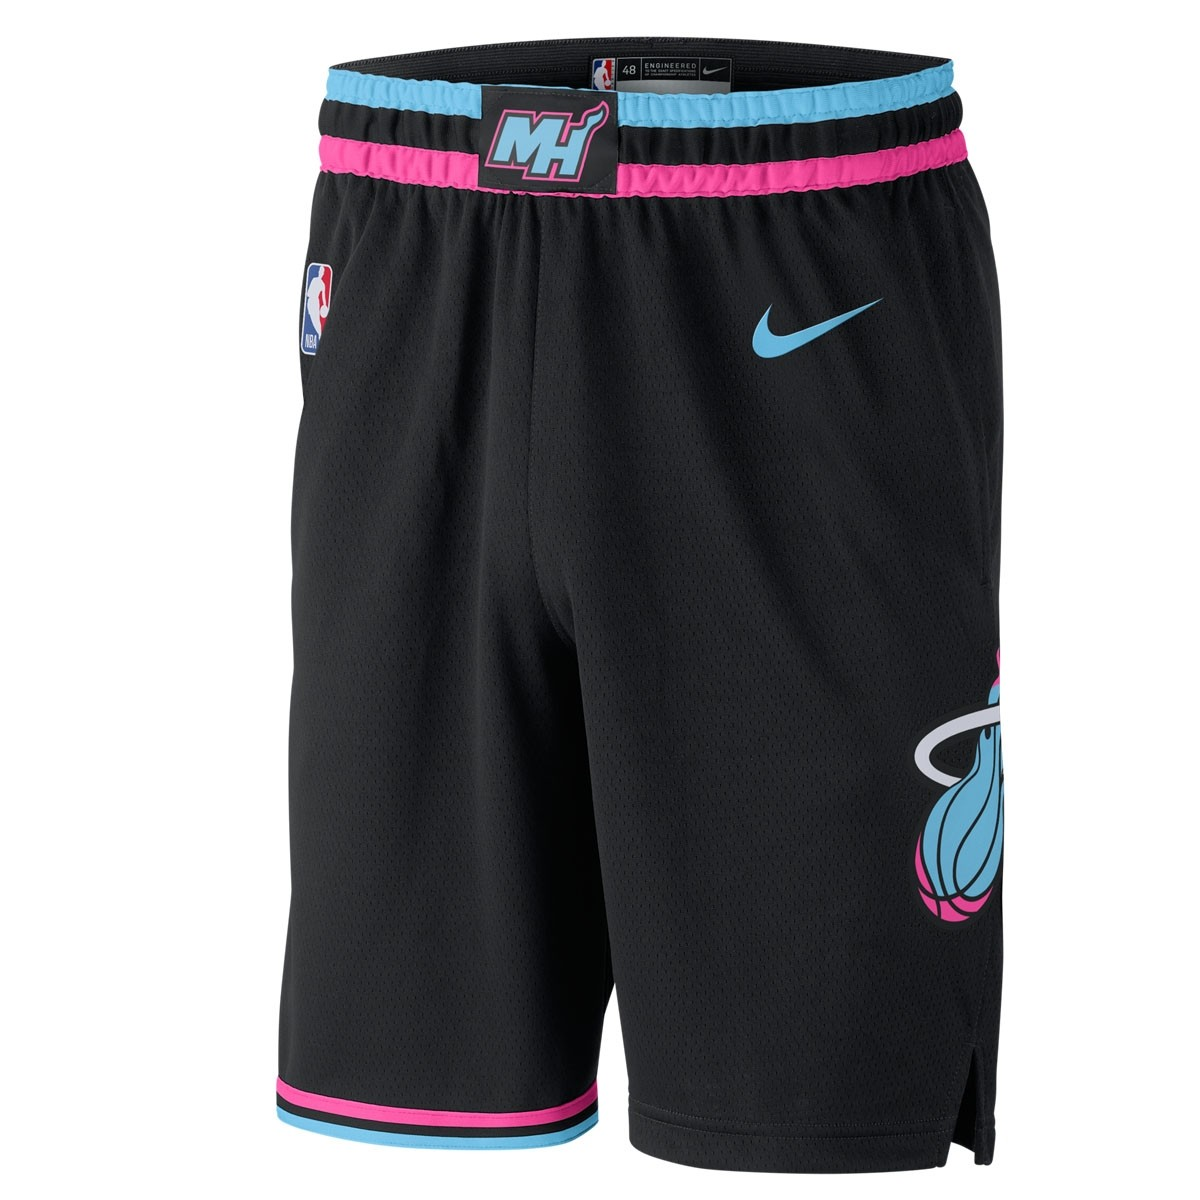 Nike NBA Miami Heat Swingman Short 'City Edition'